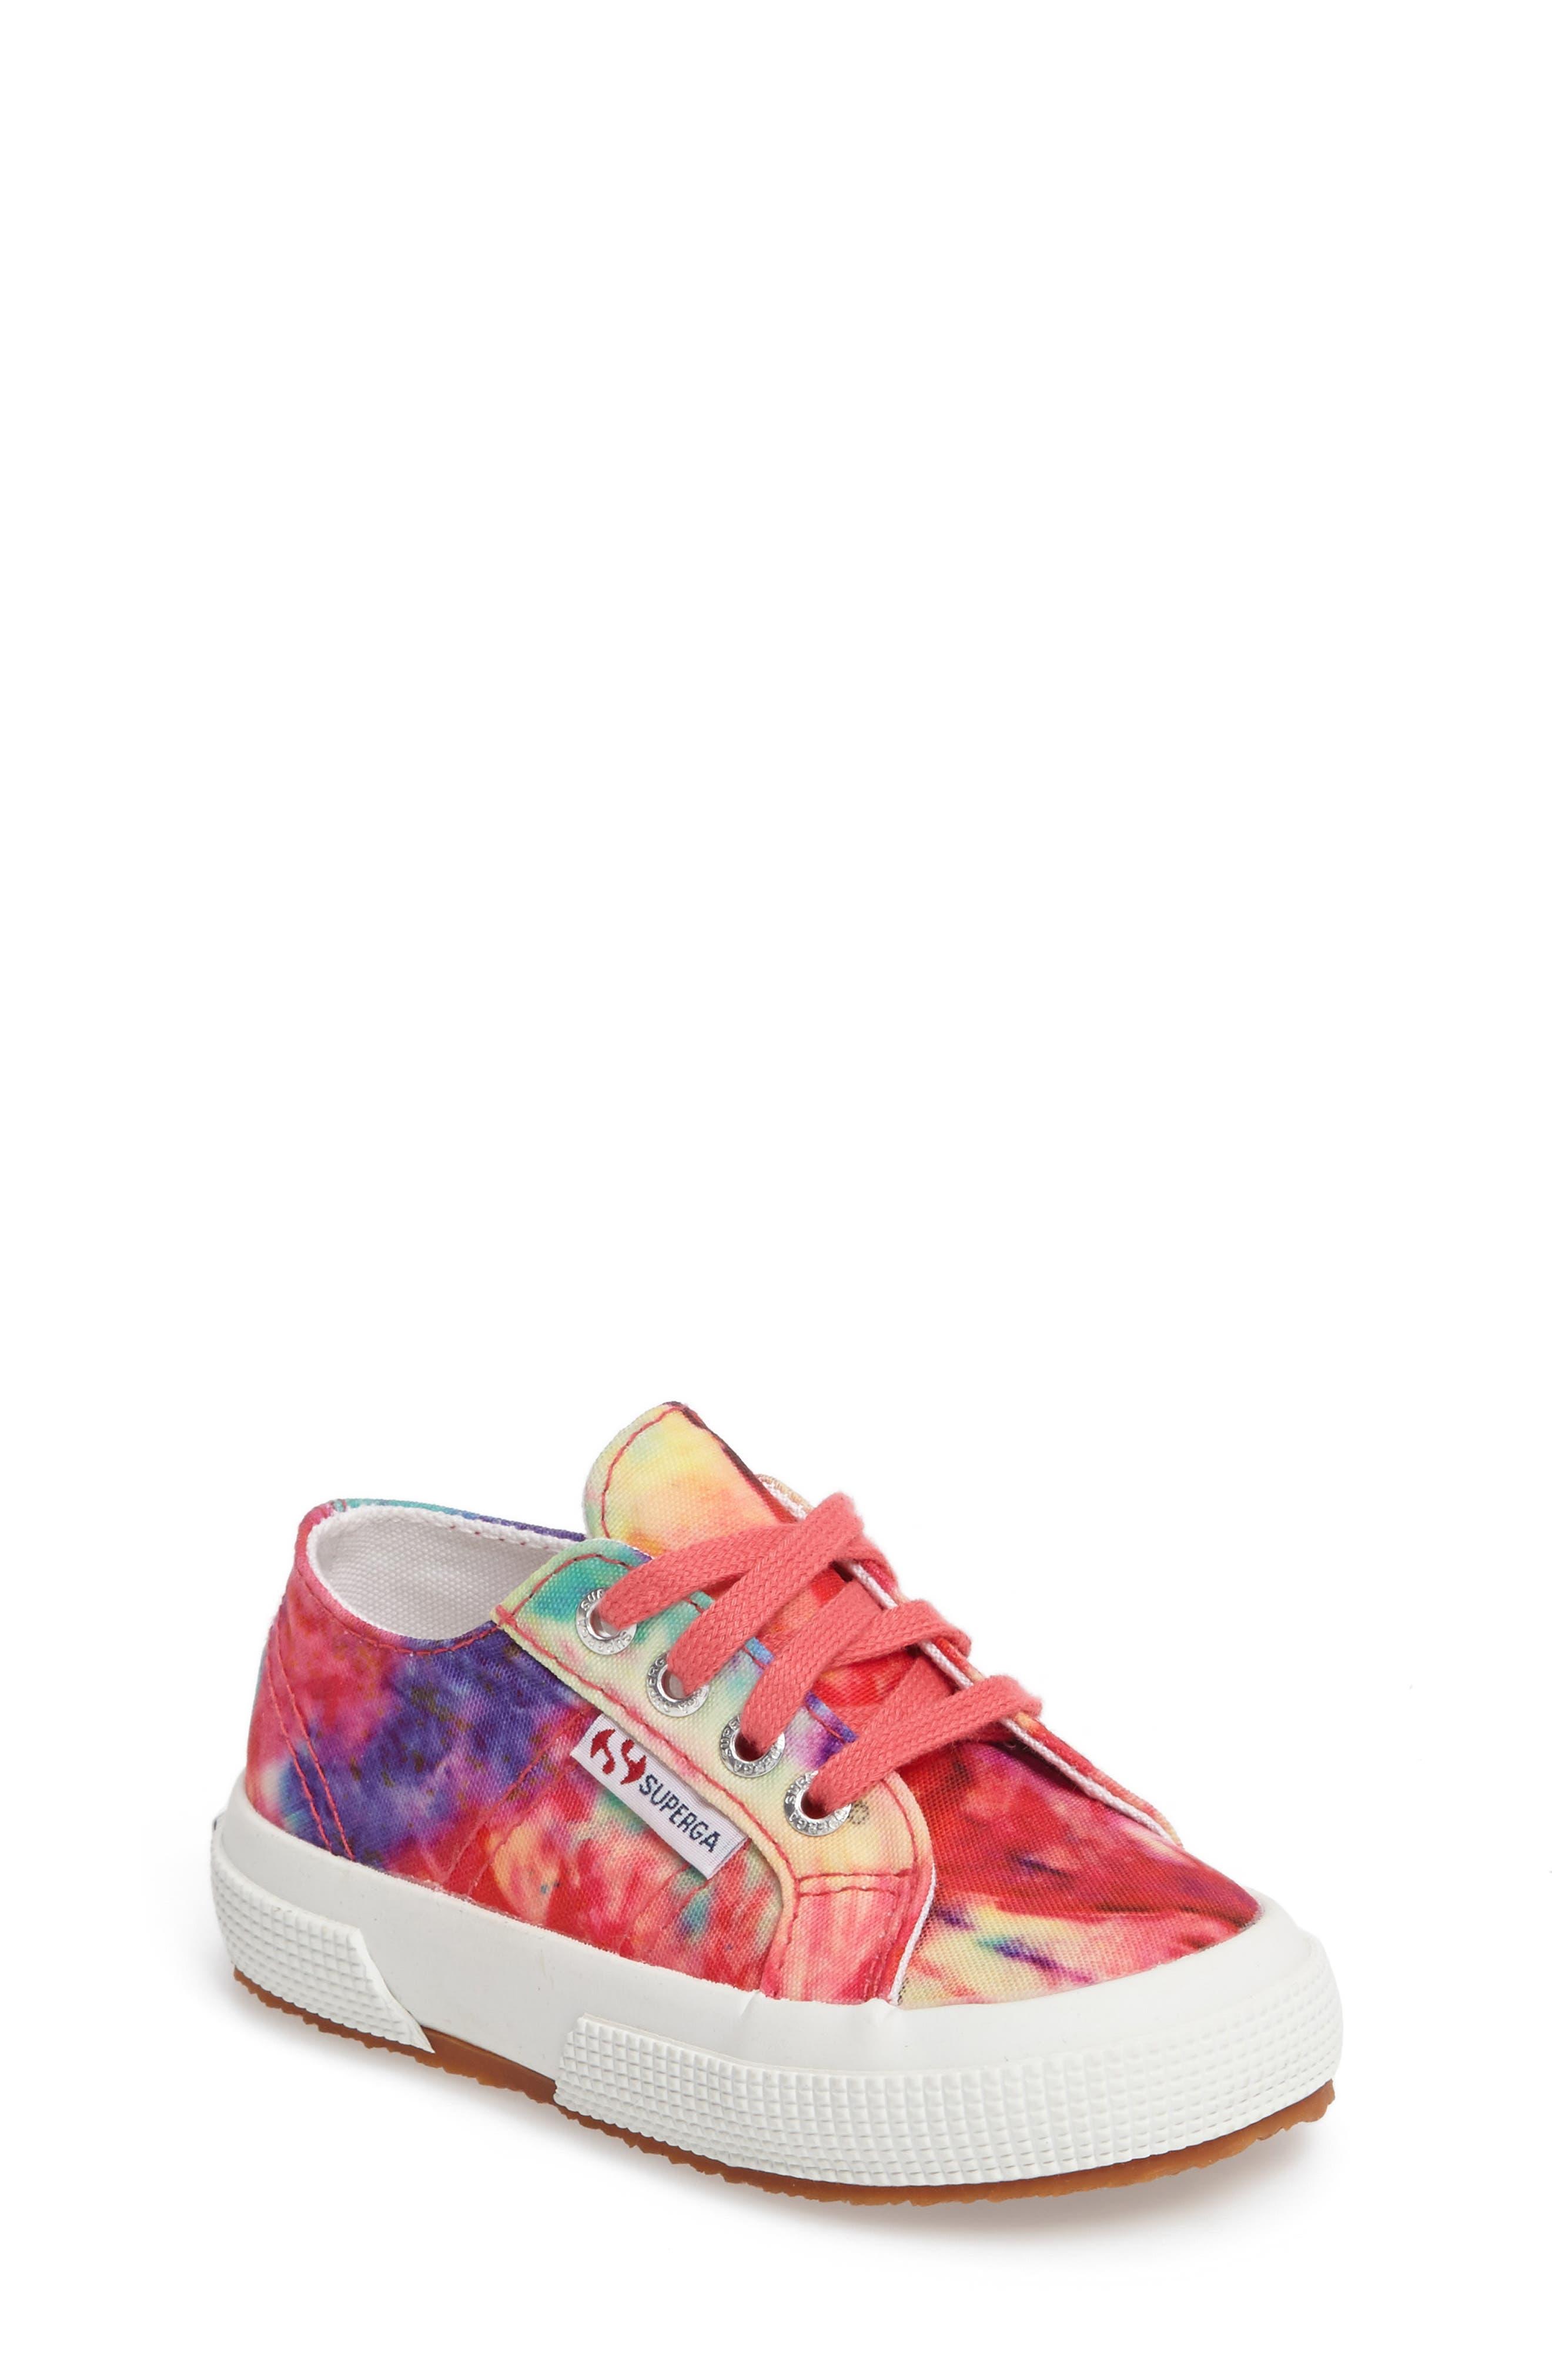 Main Image - Superga Tie Dye Classic Sneaker (Walker, Toddler & Little Kid)